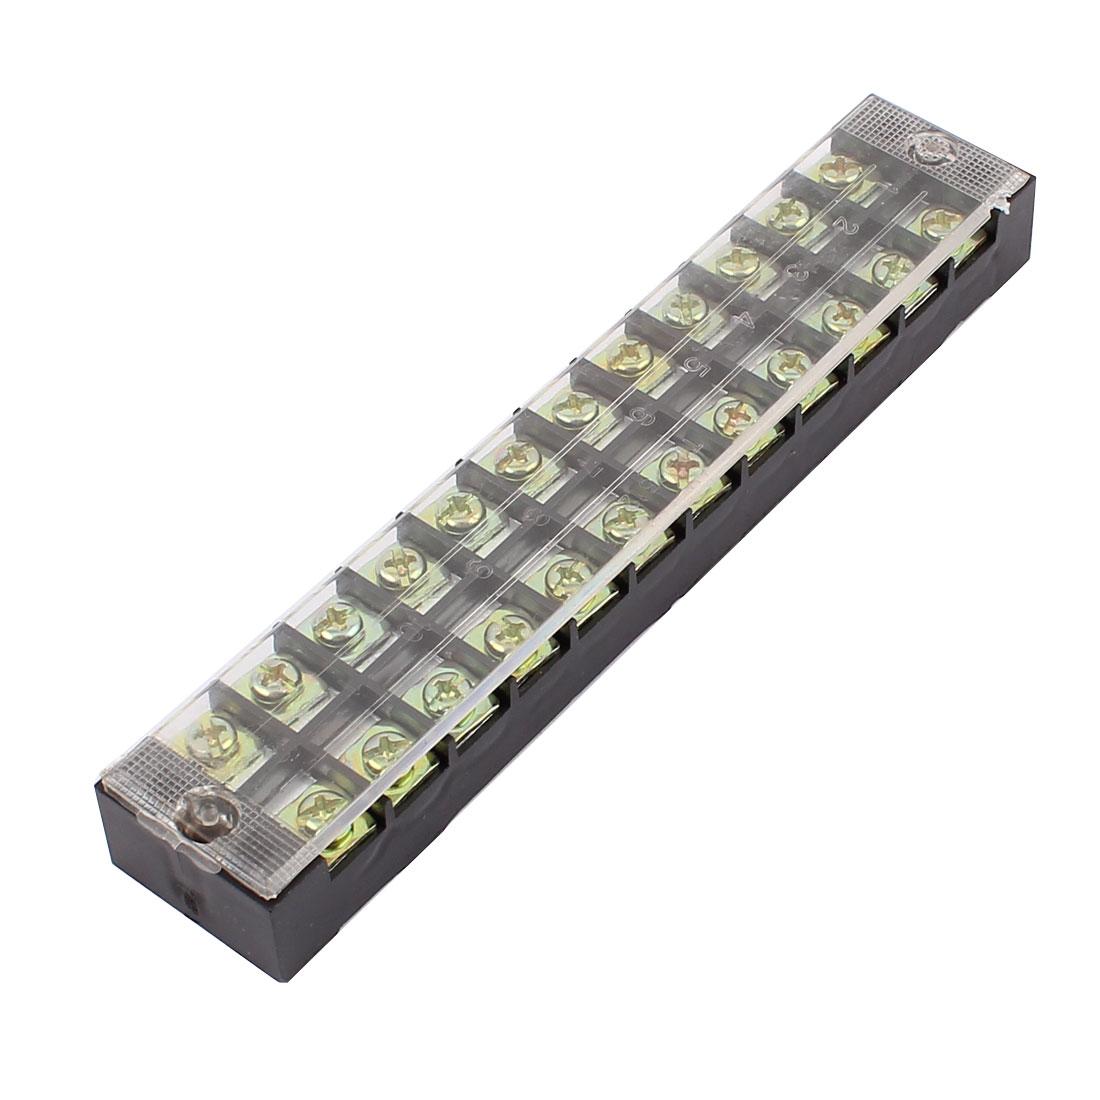 600V 25A Double Row 12 Position Screw Terminal Barrier Blocks TB2512